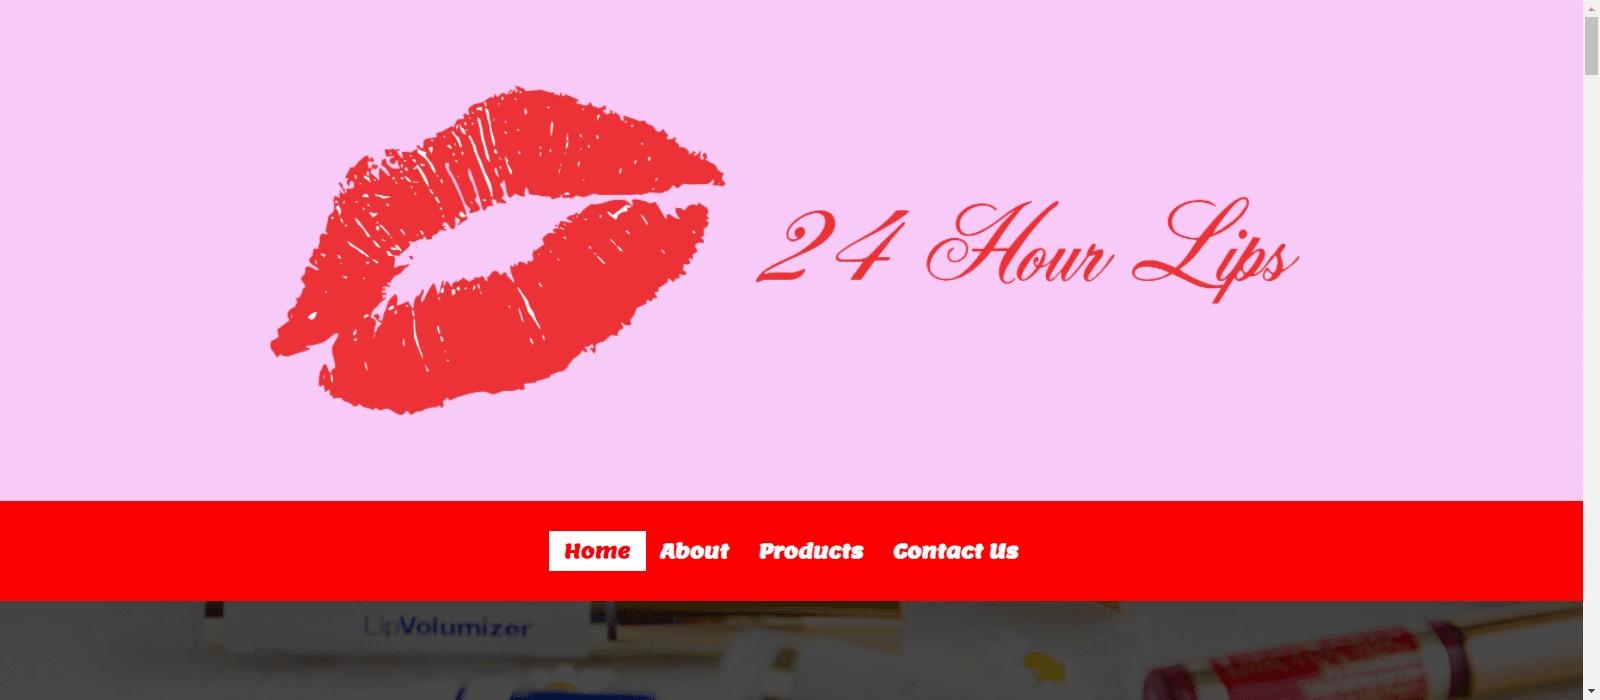 24 Hour Lips